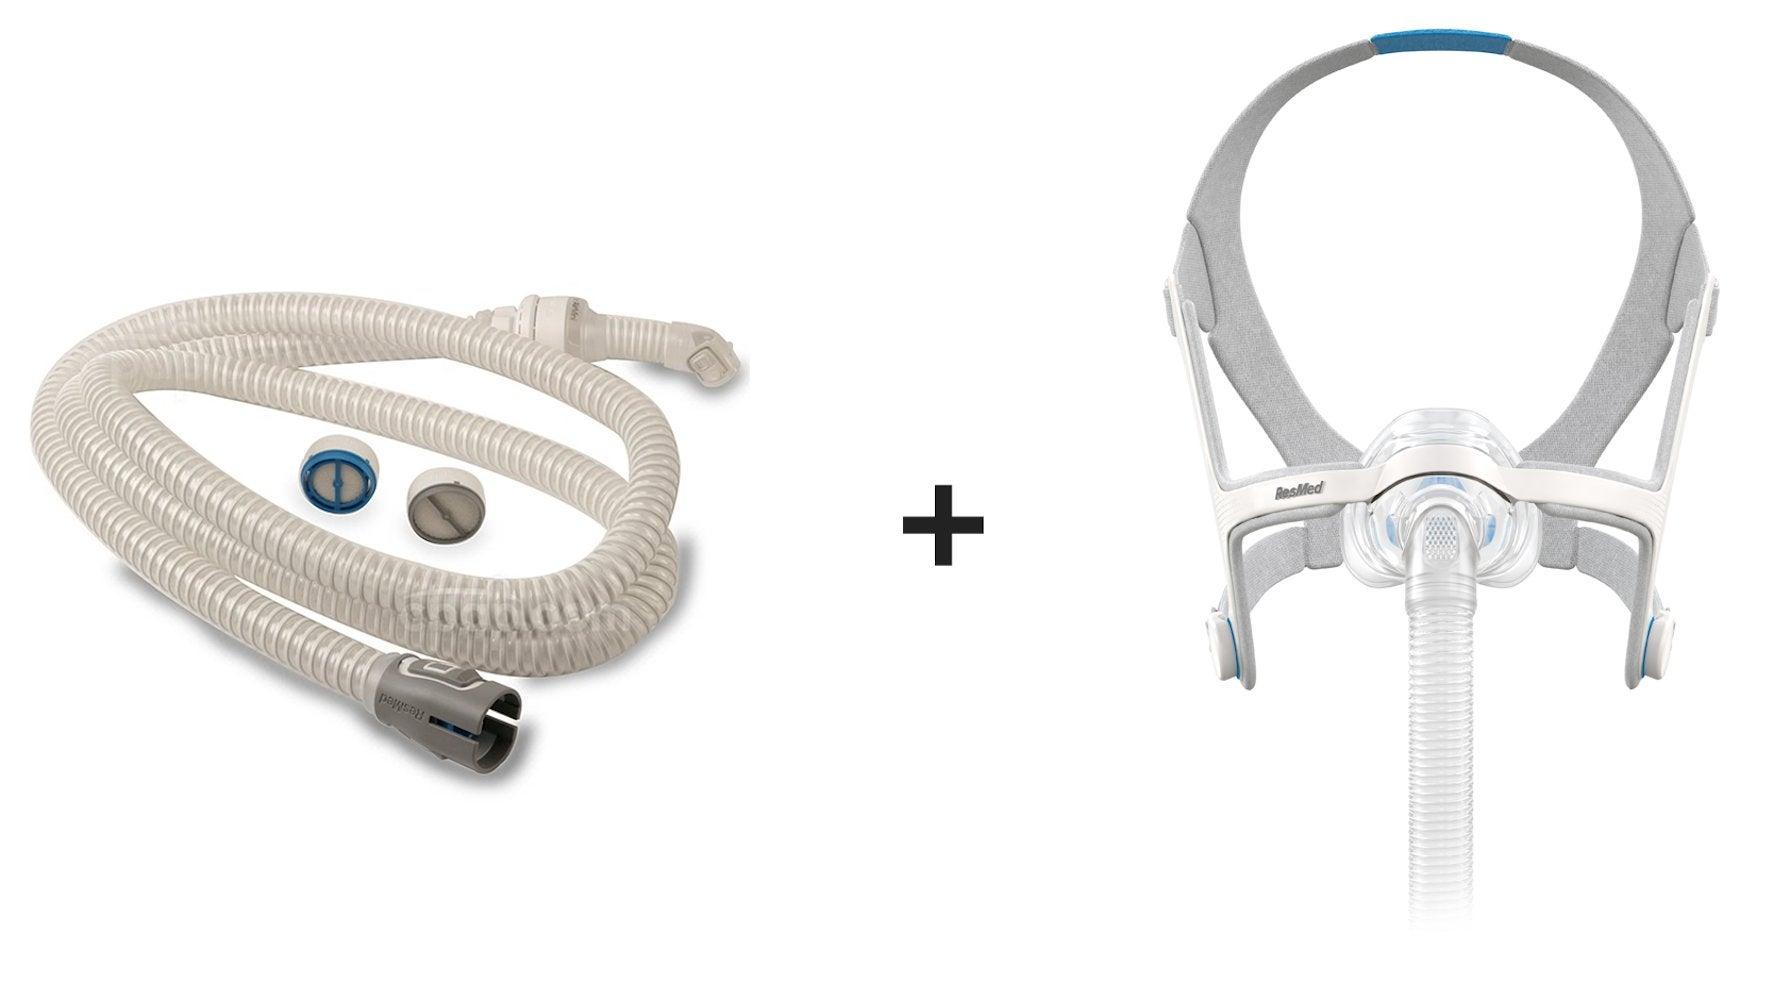 AirMini / AirFit N20 + Mask Setup Pack Bundle